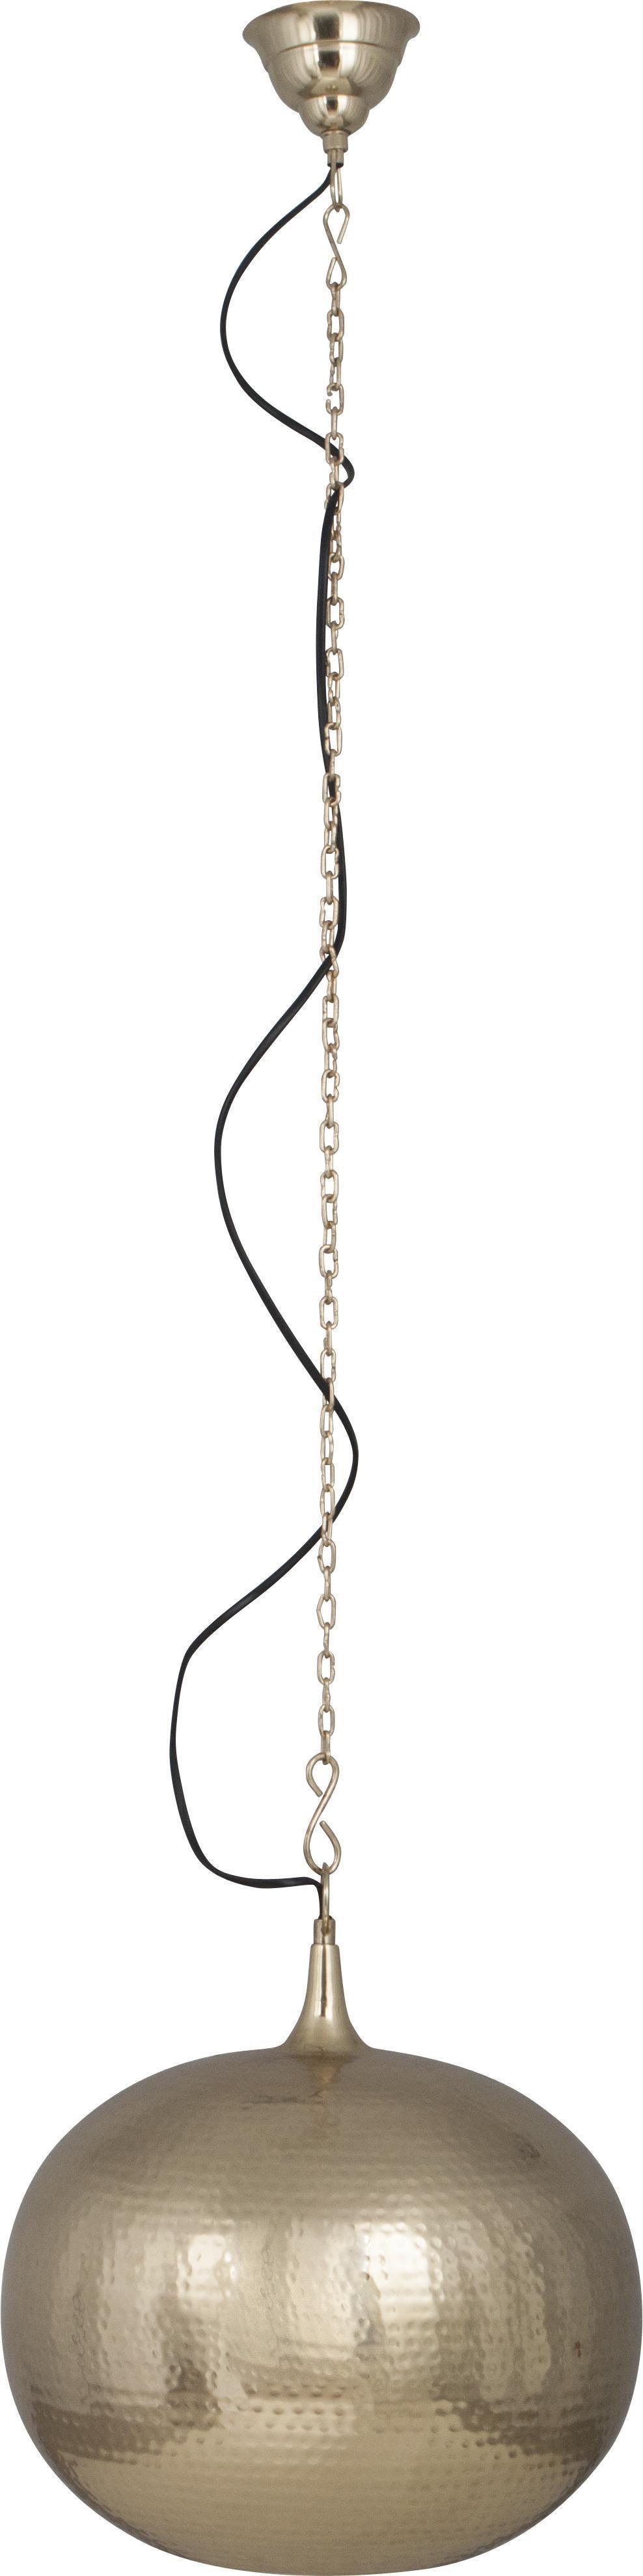 Zuiver Hammered Round hanglamp-Goud